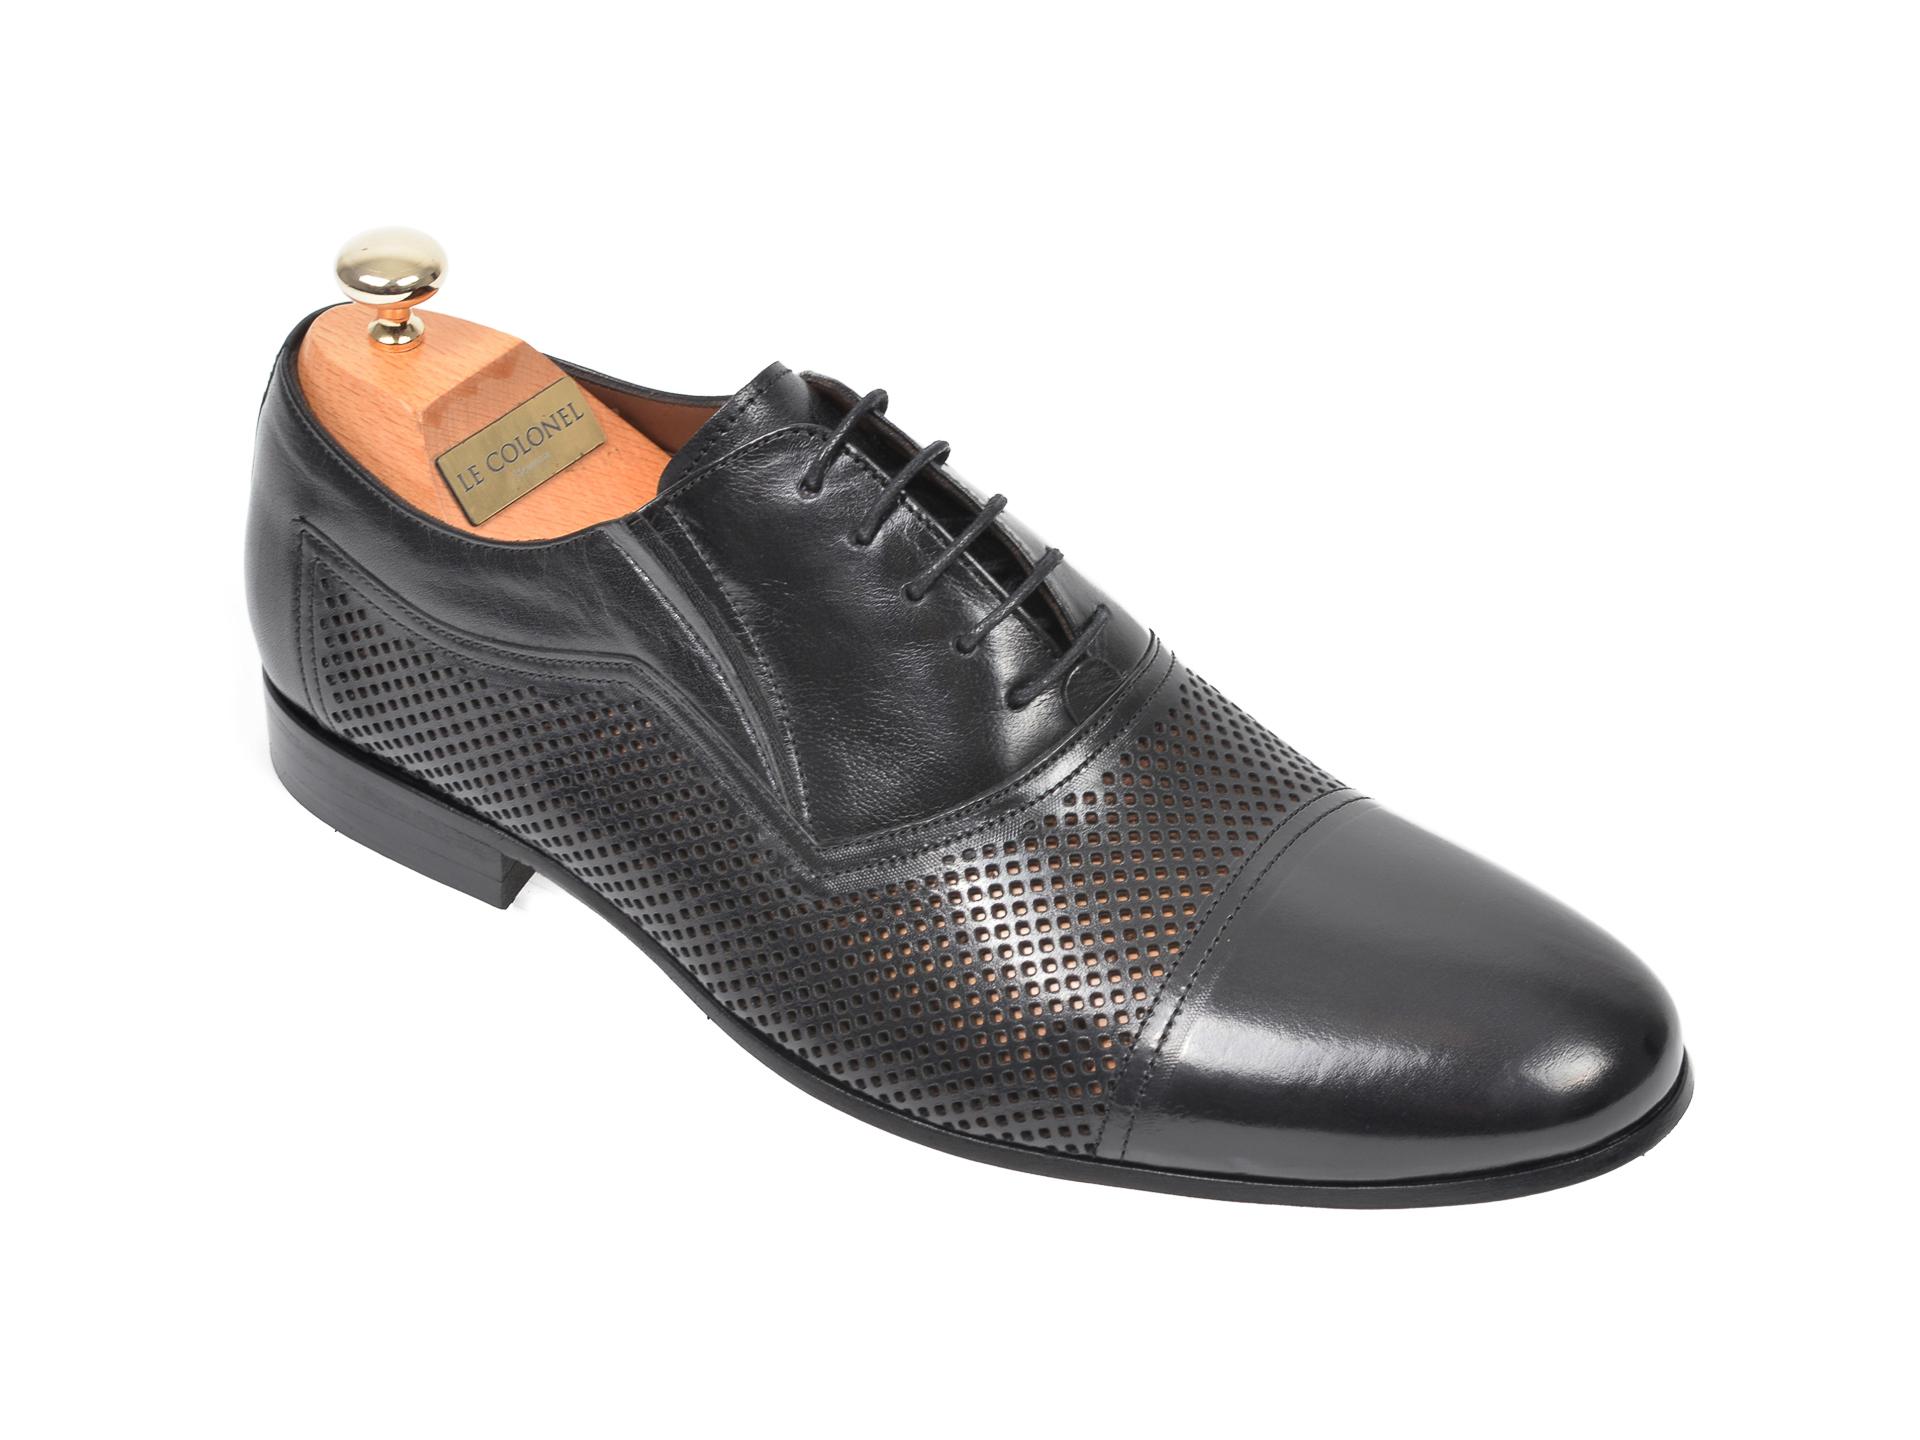 Pantofi LE COLONEL negri, 61022, din piele naturala imagine